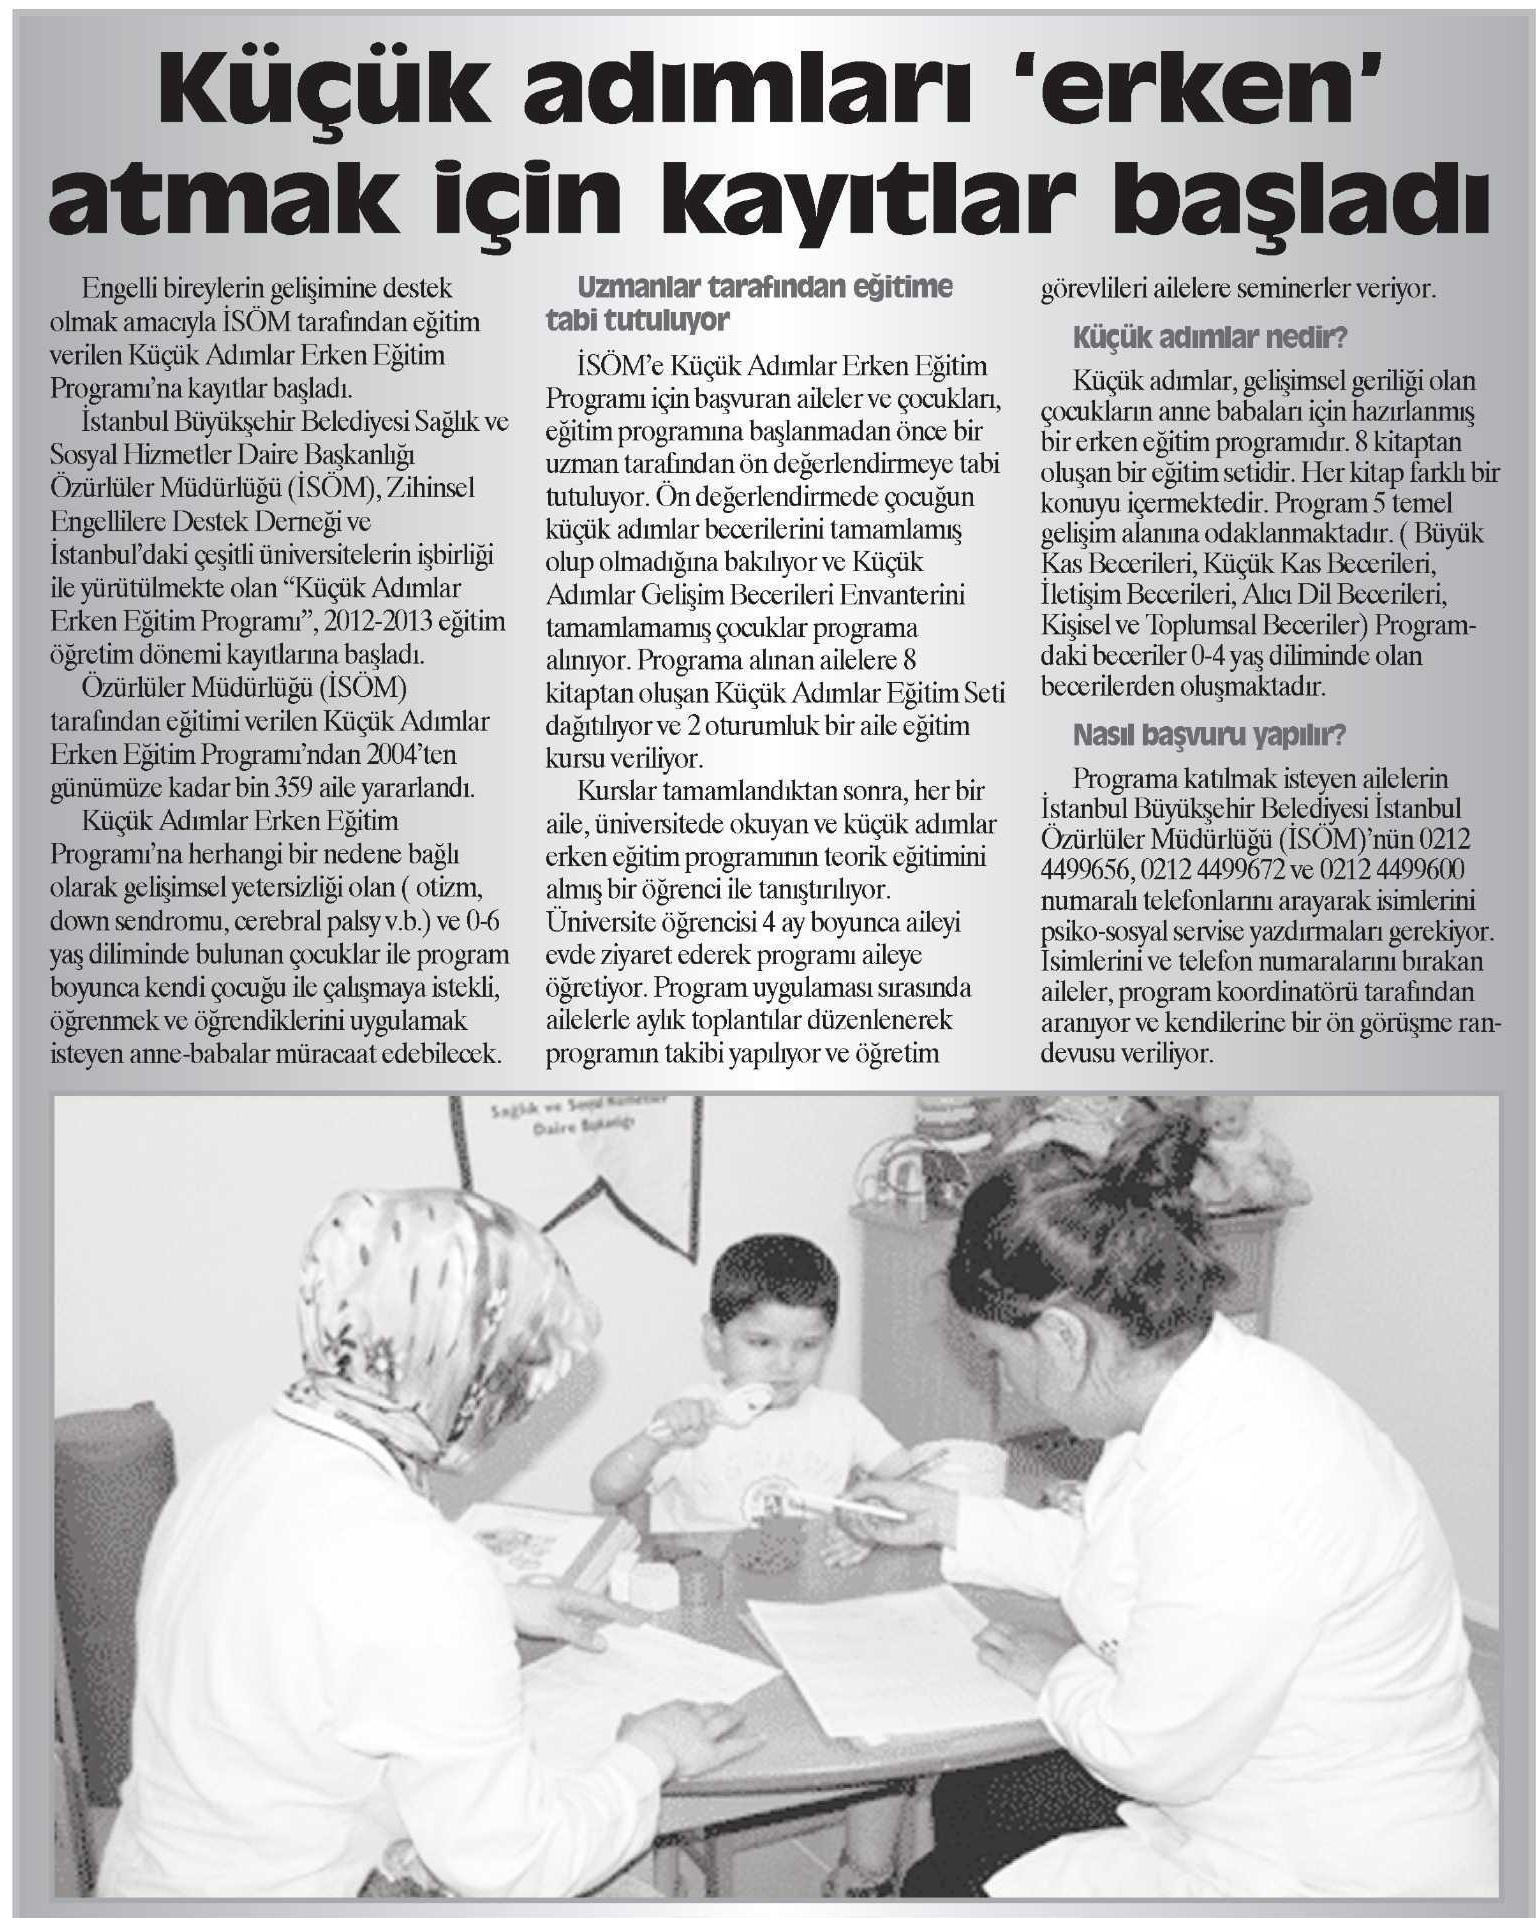 12.10.2012_haberdar_kucuk_adimlar